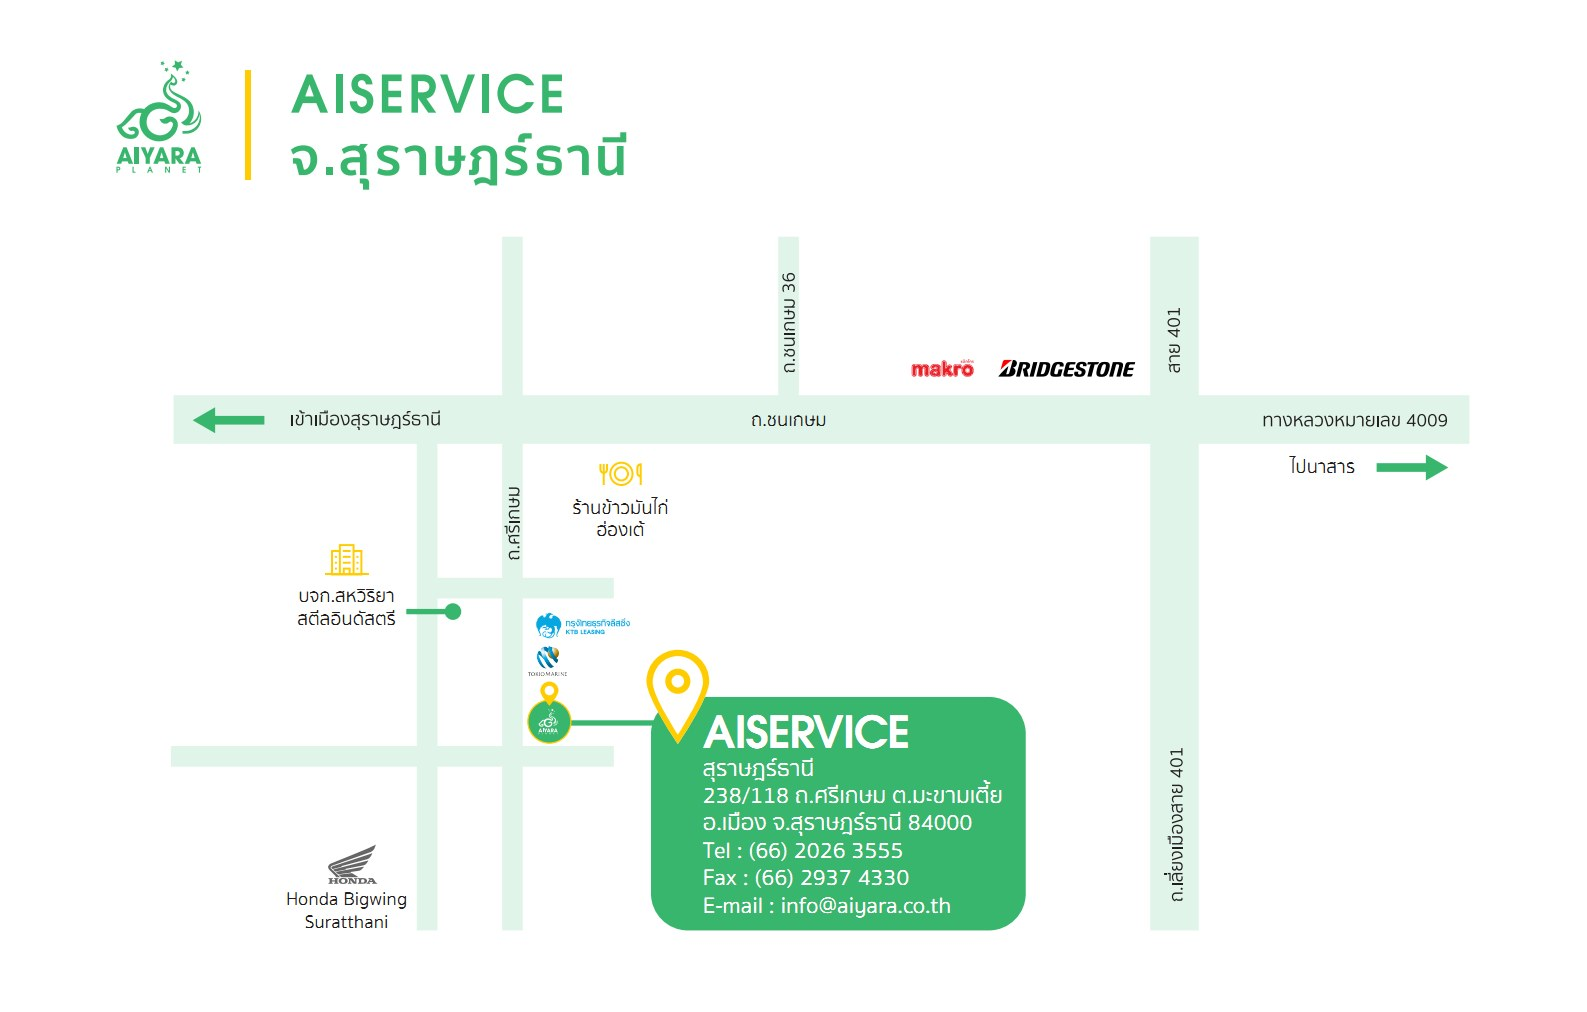 AISERVICE สุราษฎร์ธานี, ประเทศไทย